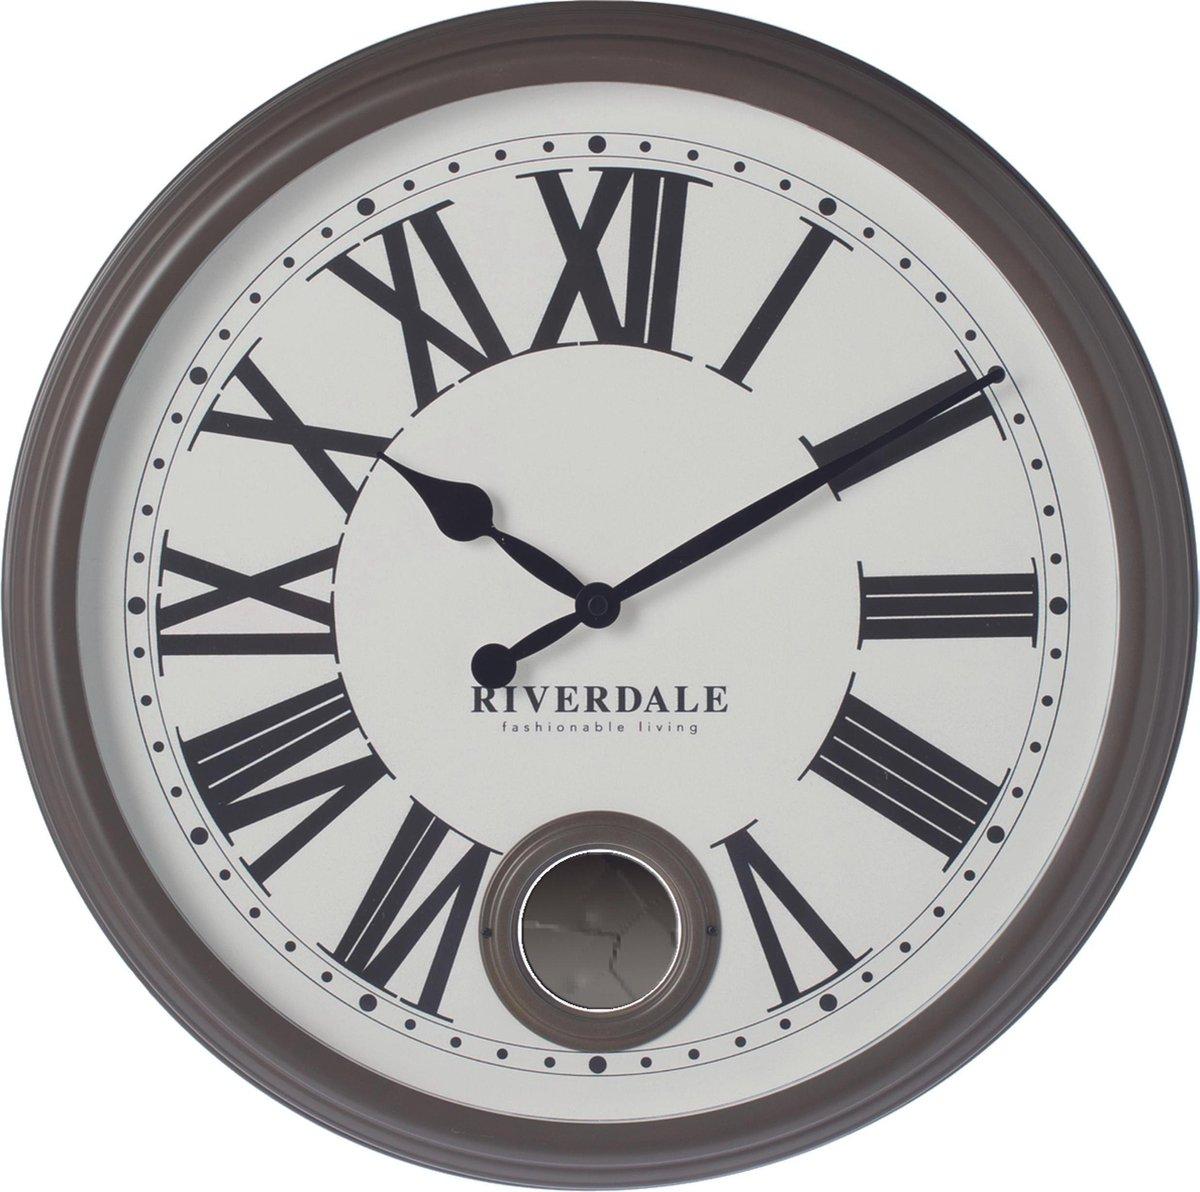 Riverdale Classic - Wandklok - 42cm - bruin - Riverdale